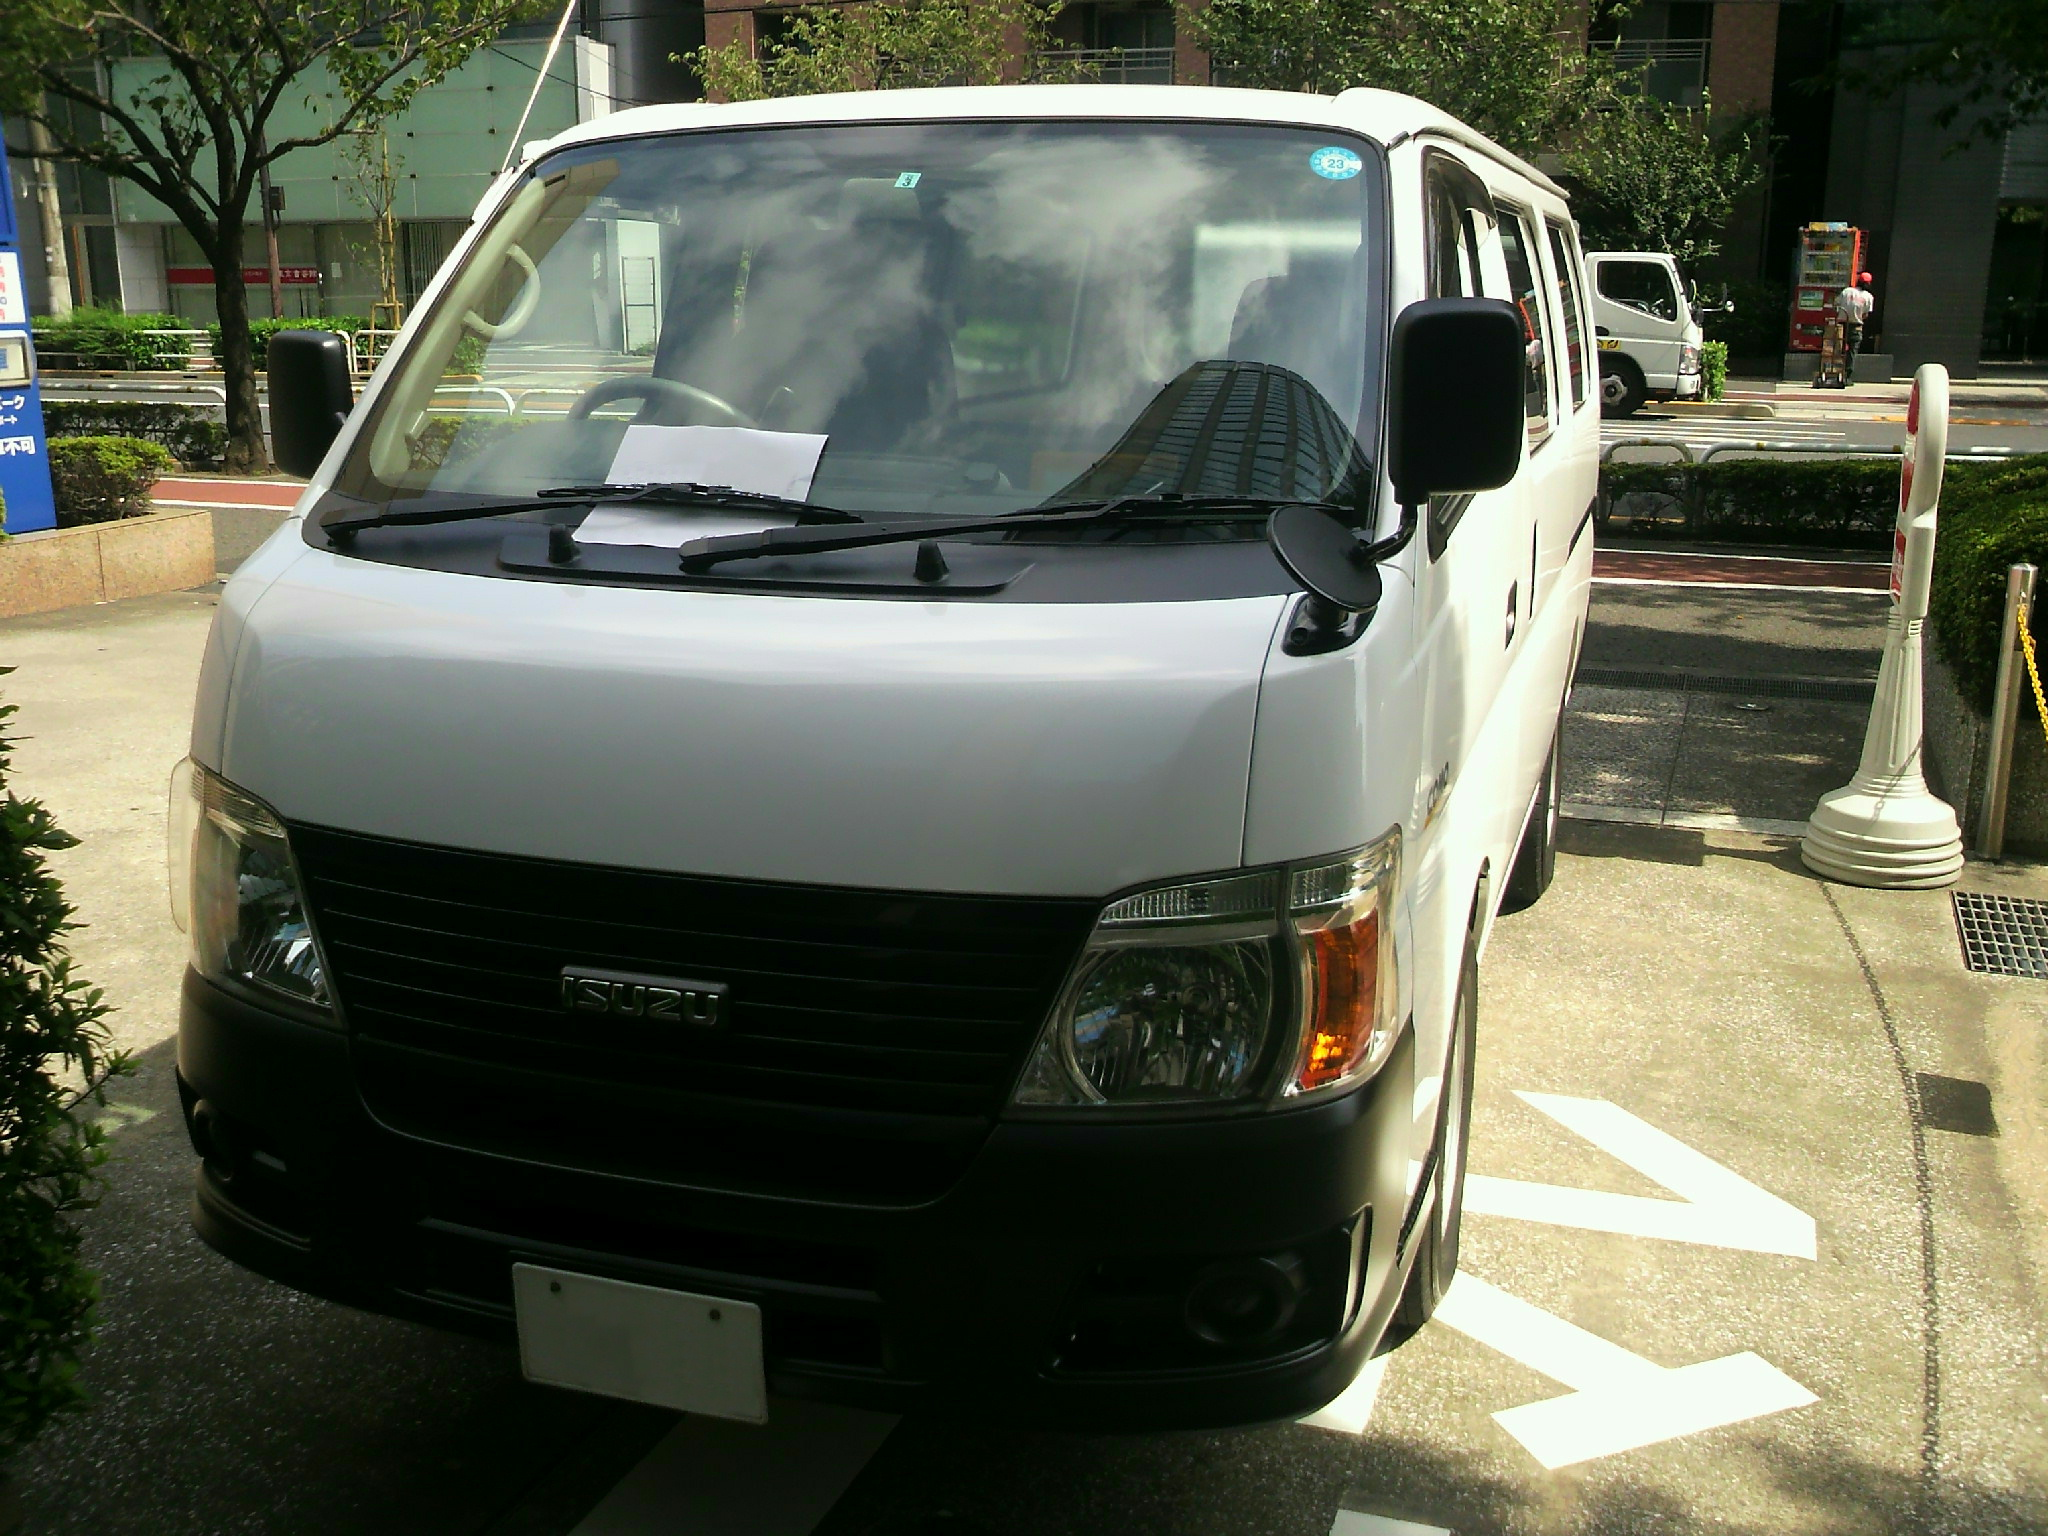 File:ISUZU COMO, White Van, Front Perspective View.jpg ...